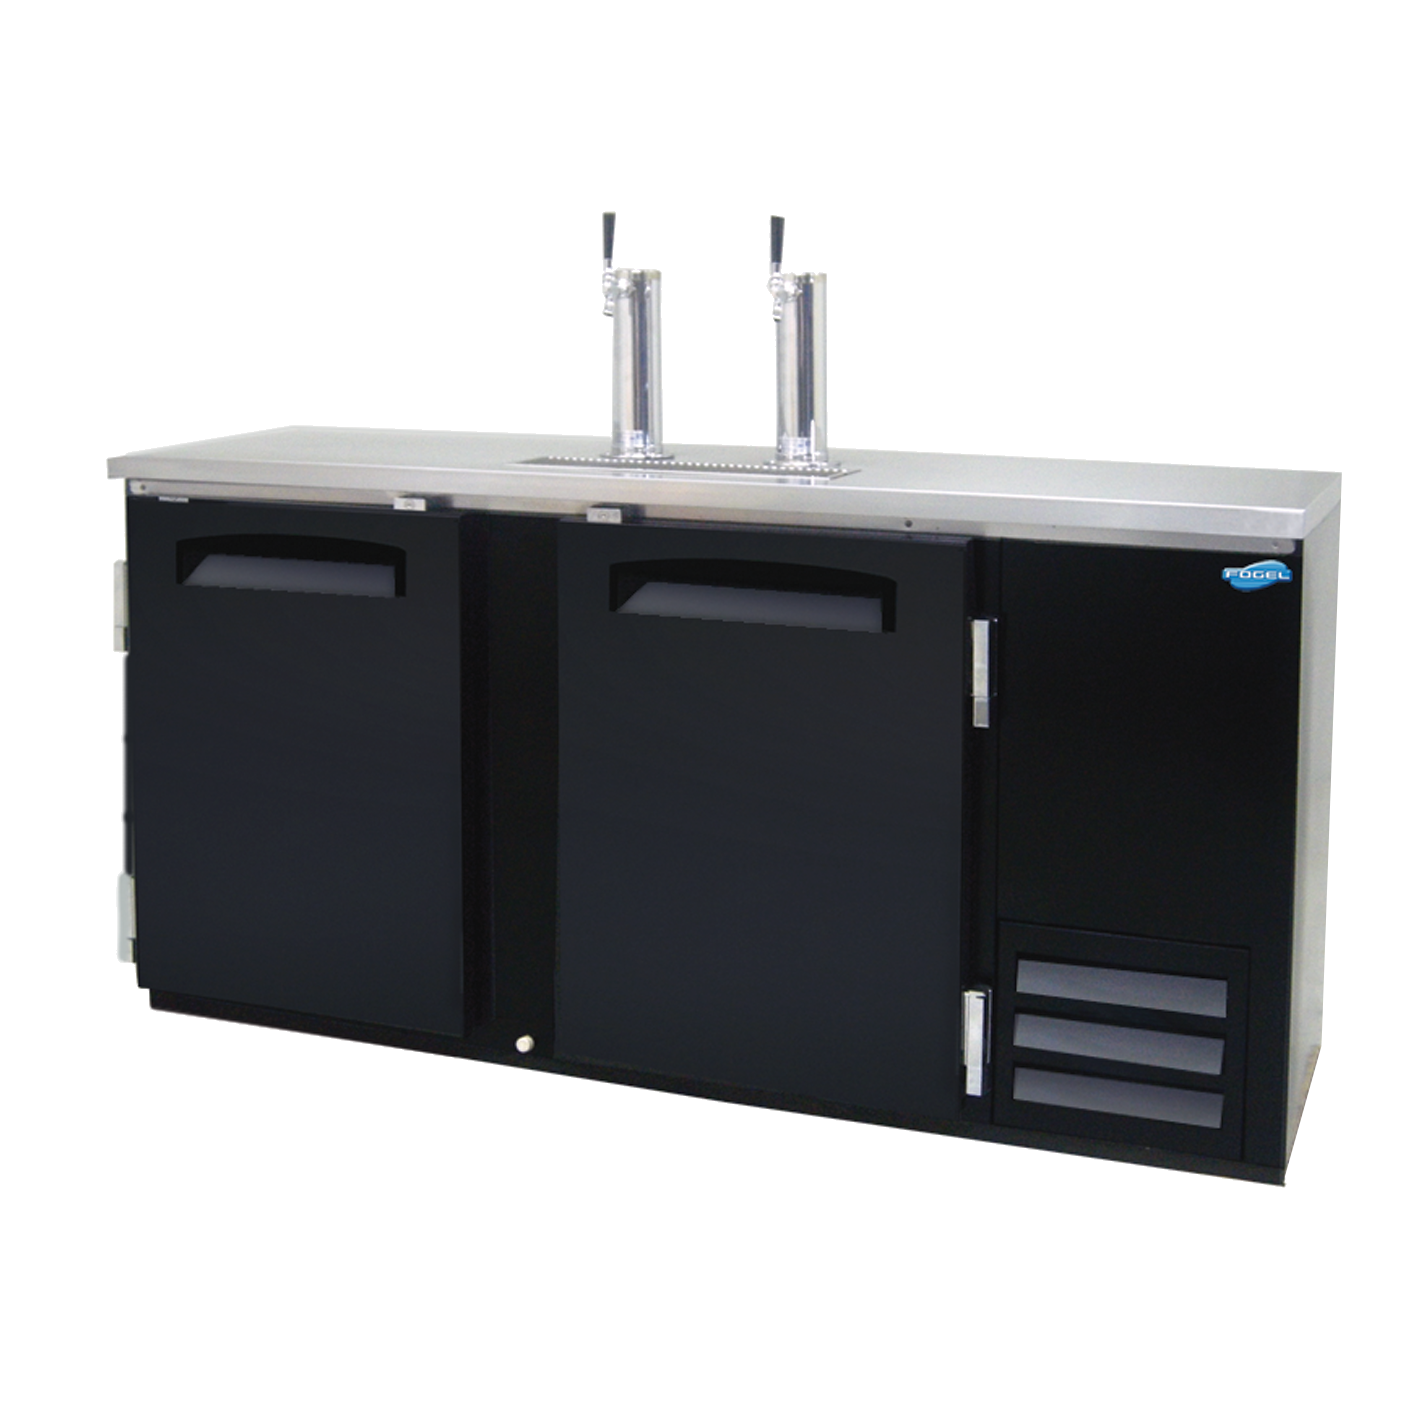 Fogel USA DBD-3E3 draft beer cooler